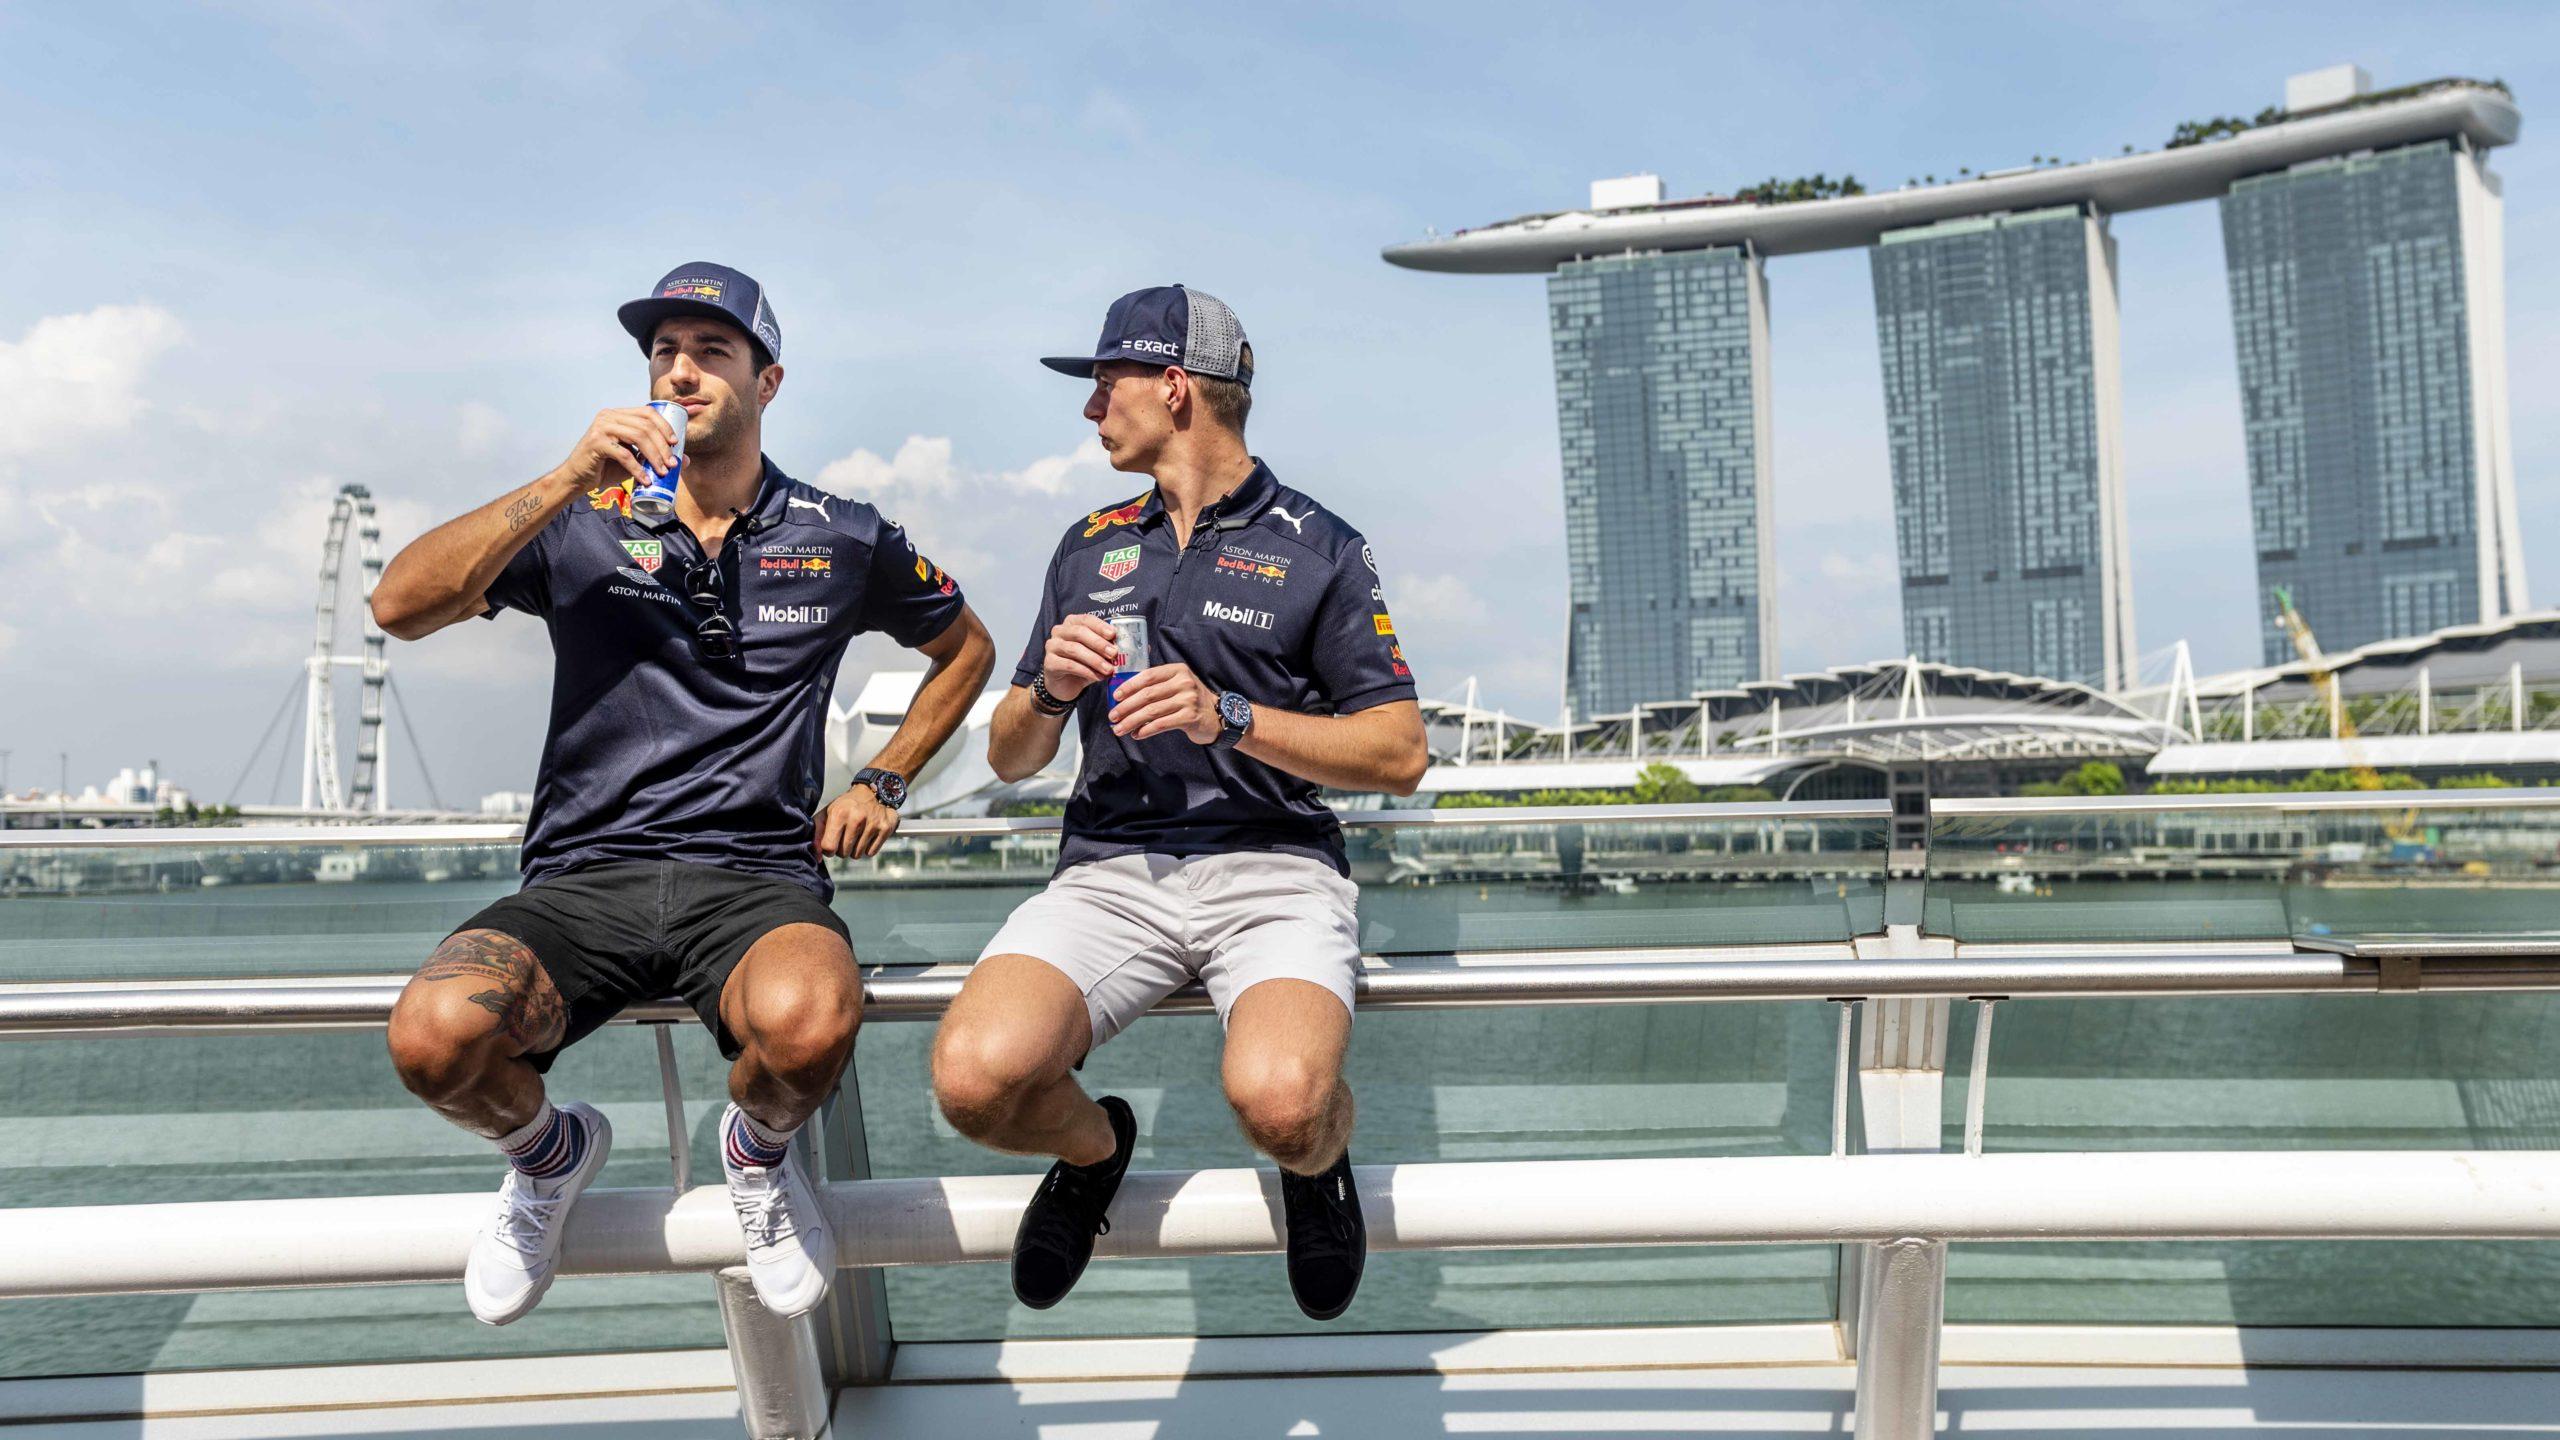 Daniel Riccardo and Max Verstappen - Lifestyle